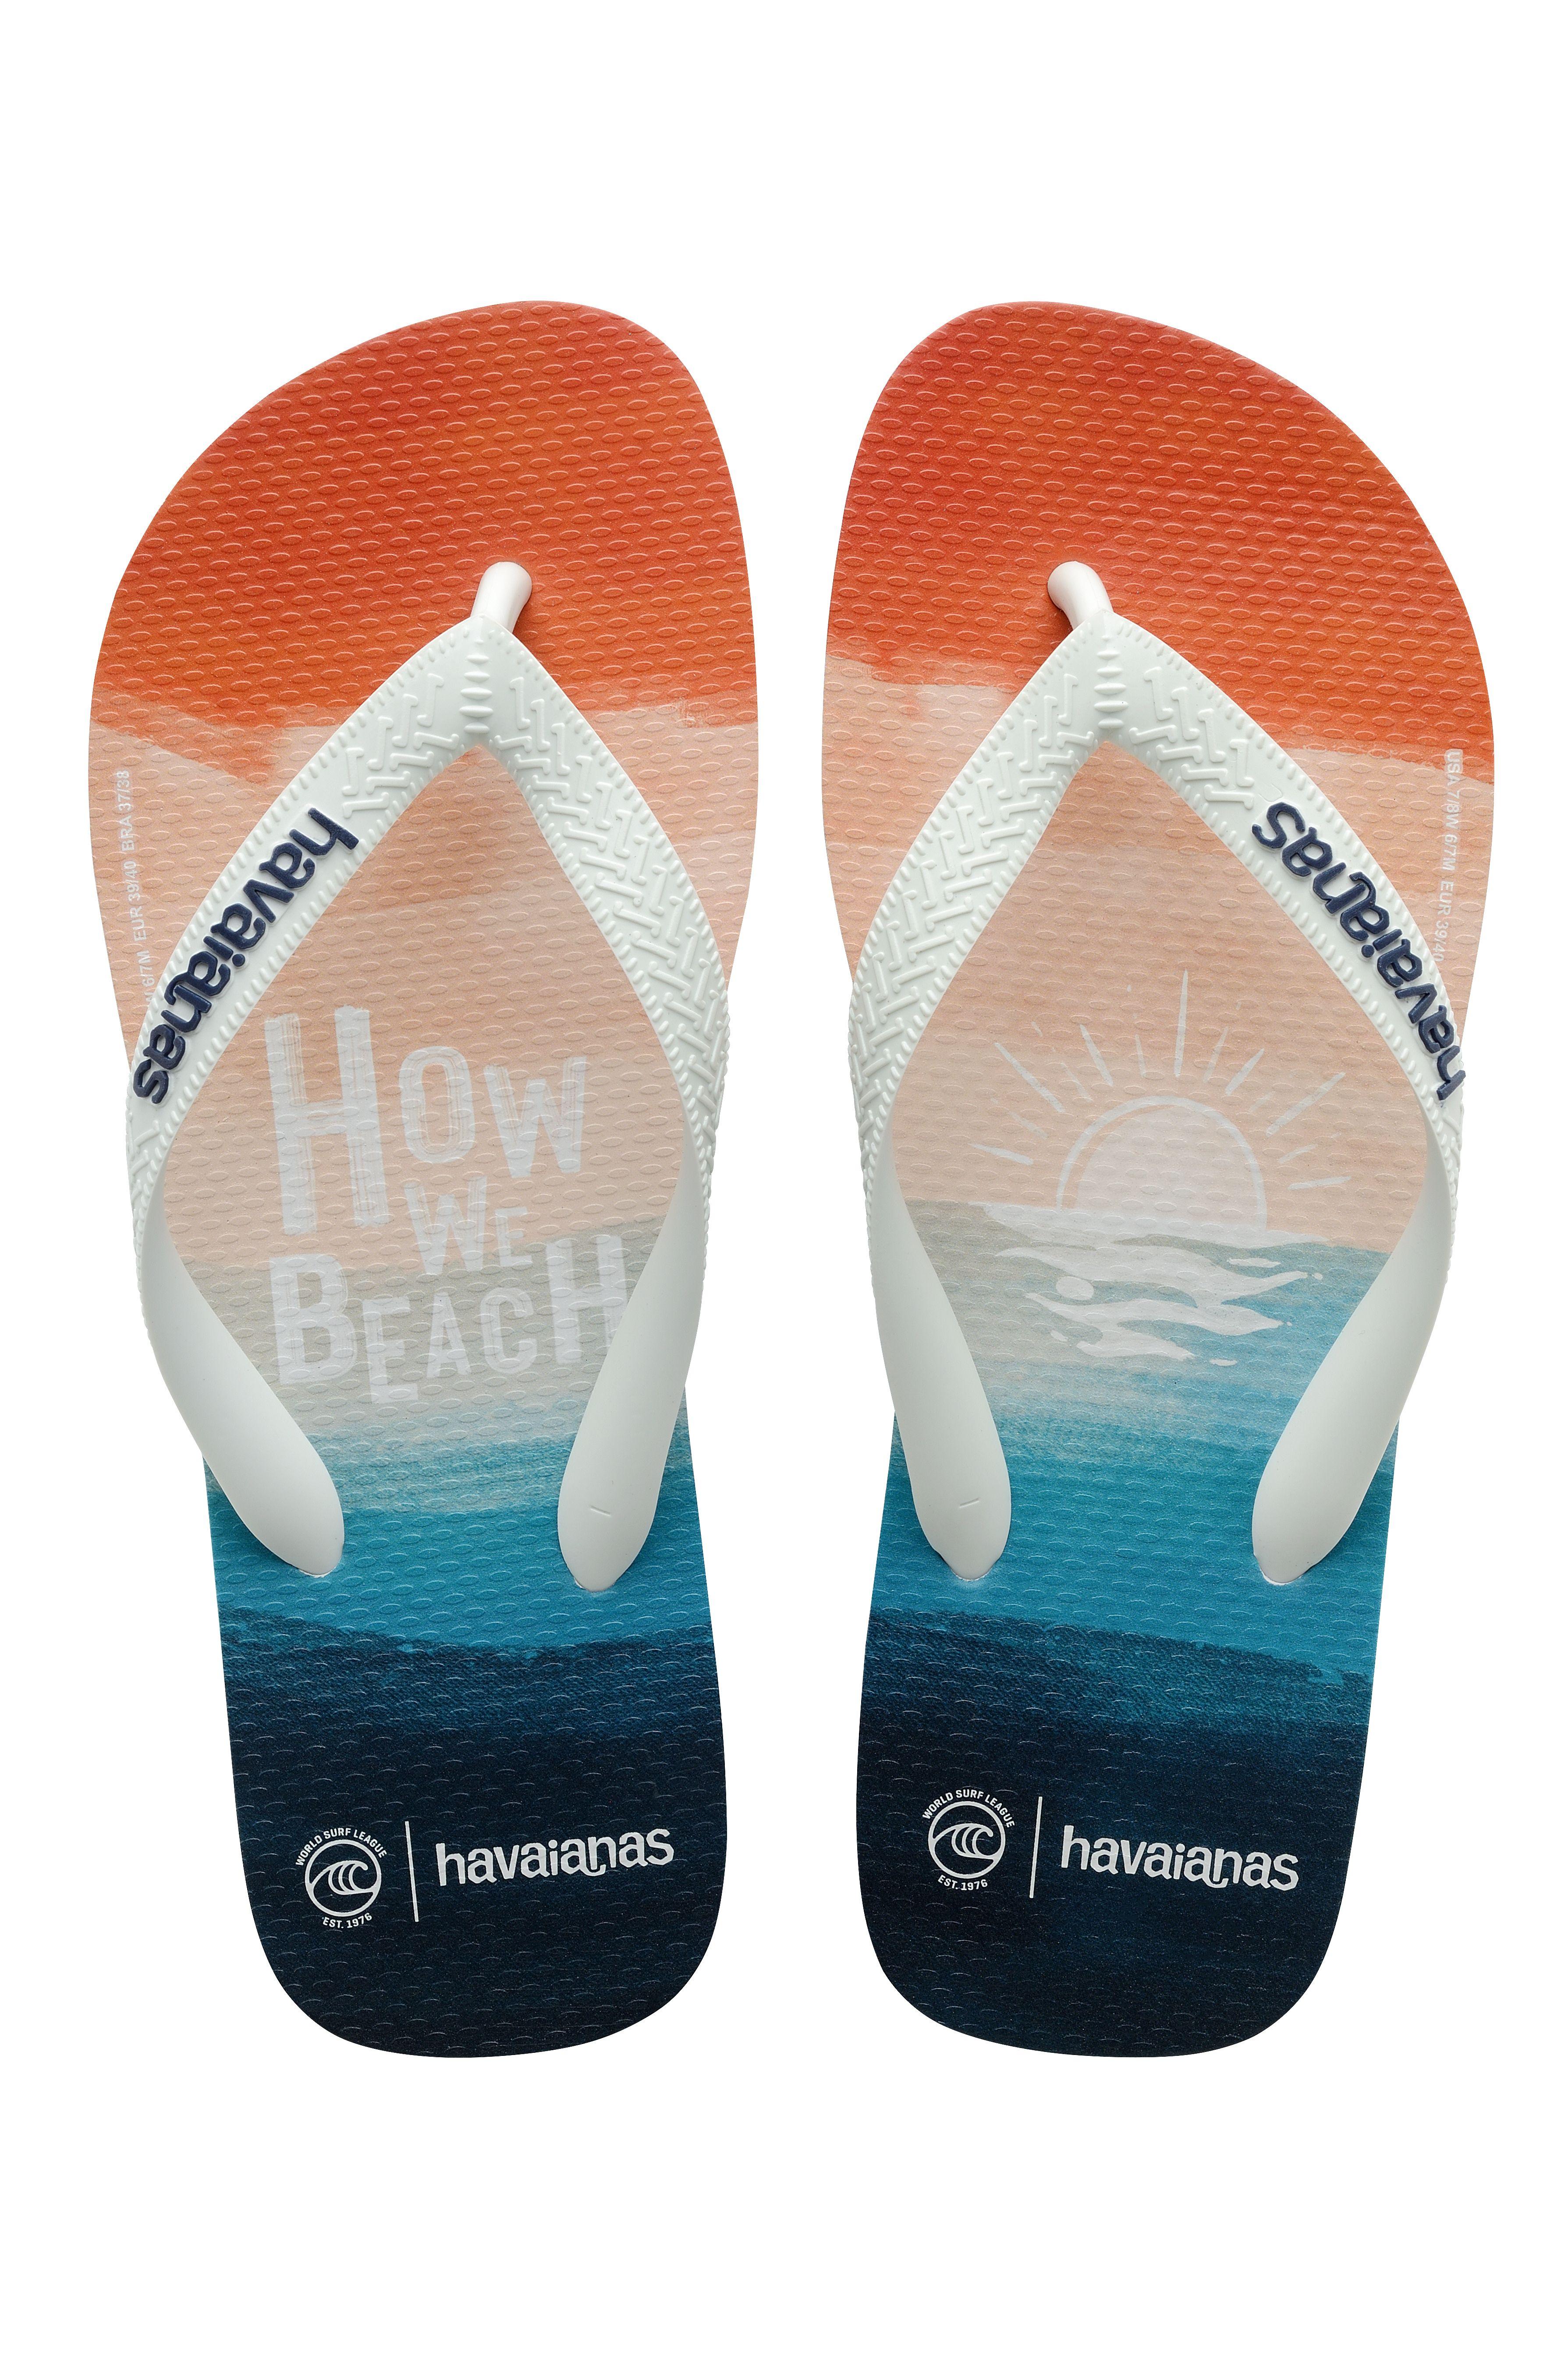 Havaianas Sandals TOP WSL HOW WE BEACH Nautical Blue